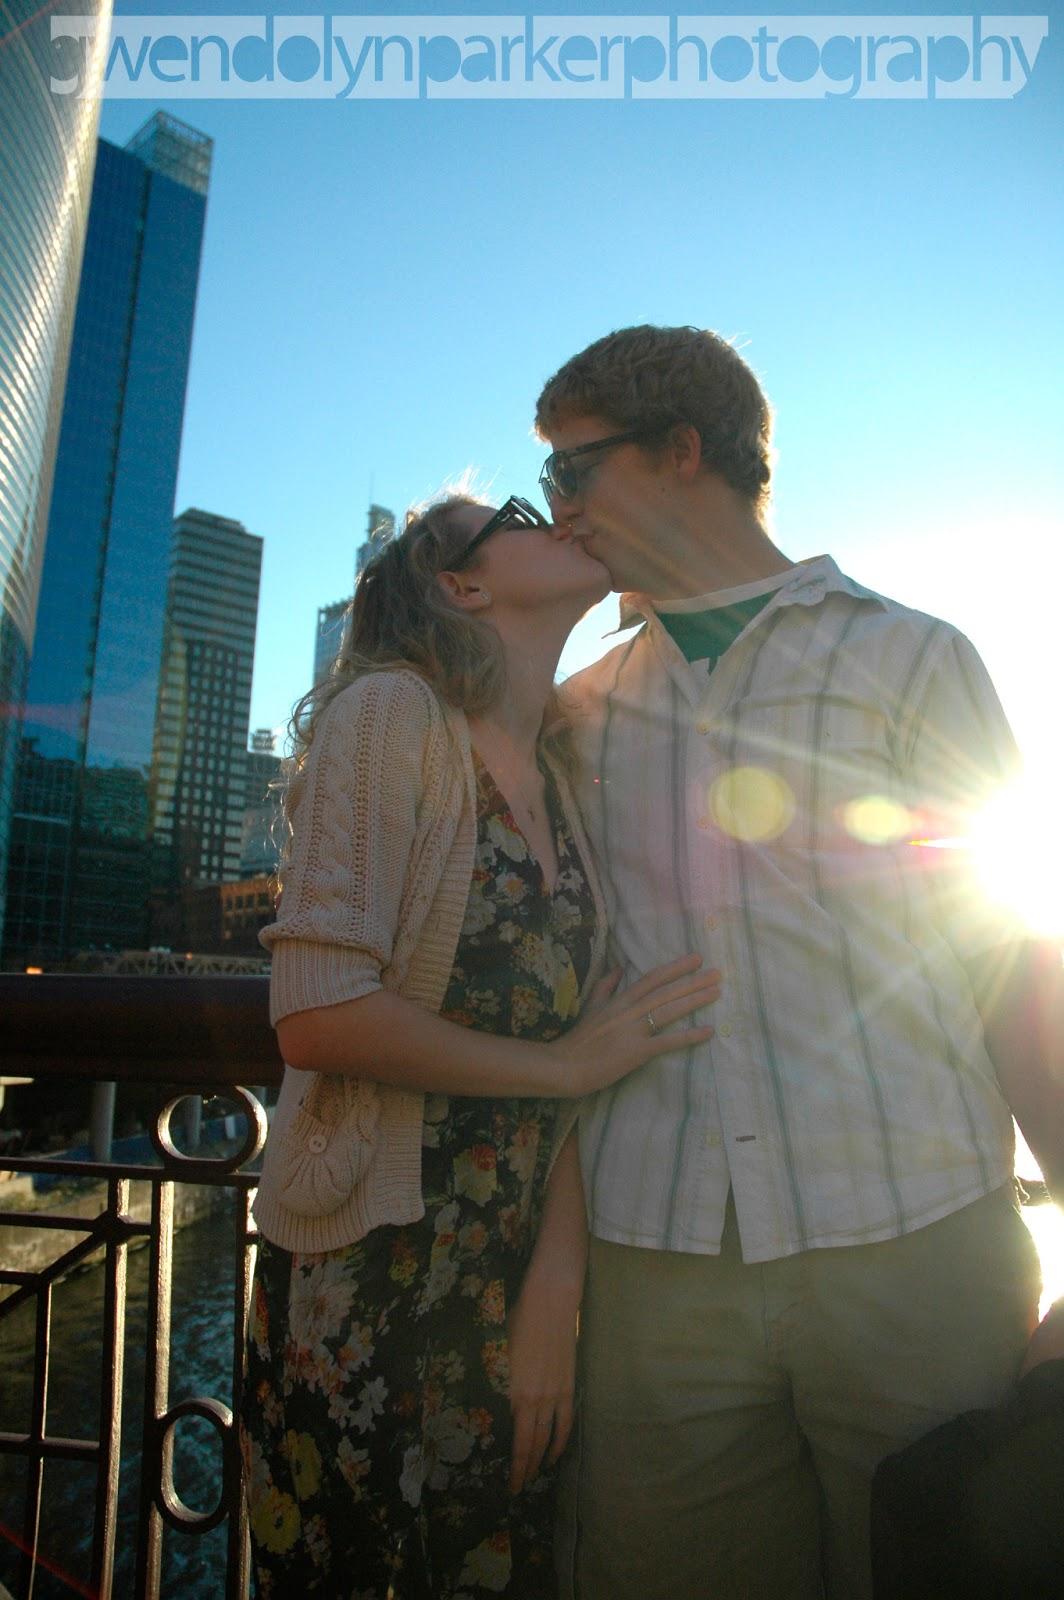 Gay dating site spanish lake missouri